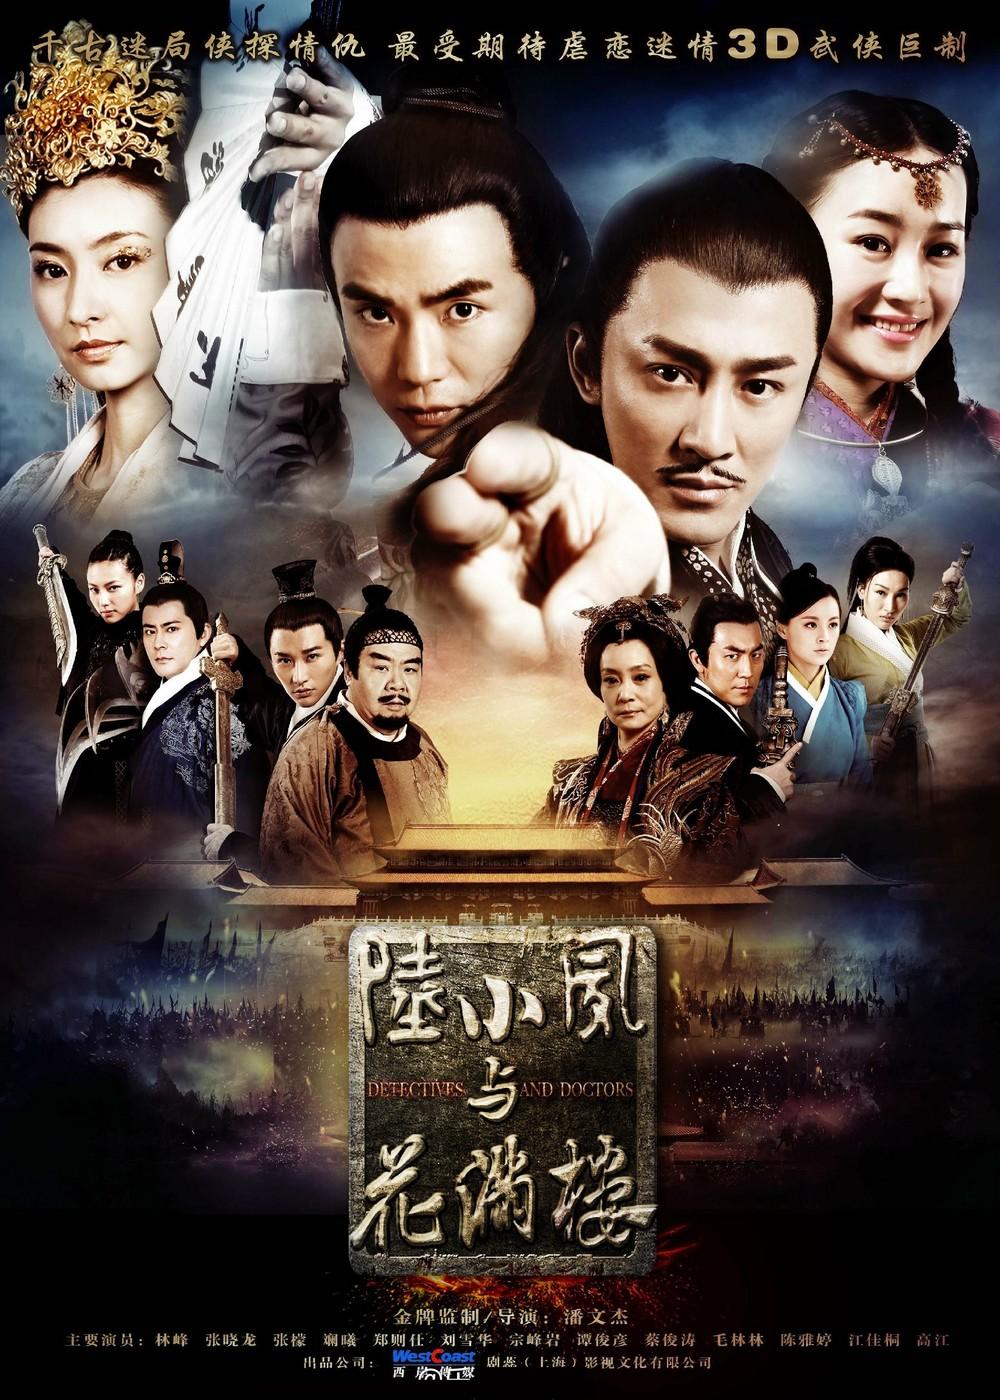 Detectives and Doctors – 陸小鳳與花滿樓[粵語 Cantonese Version]